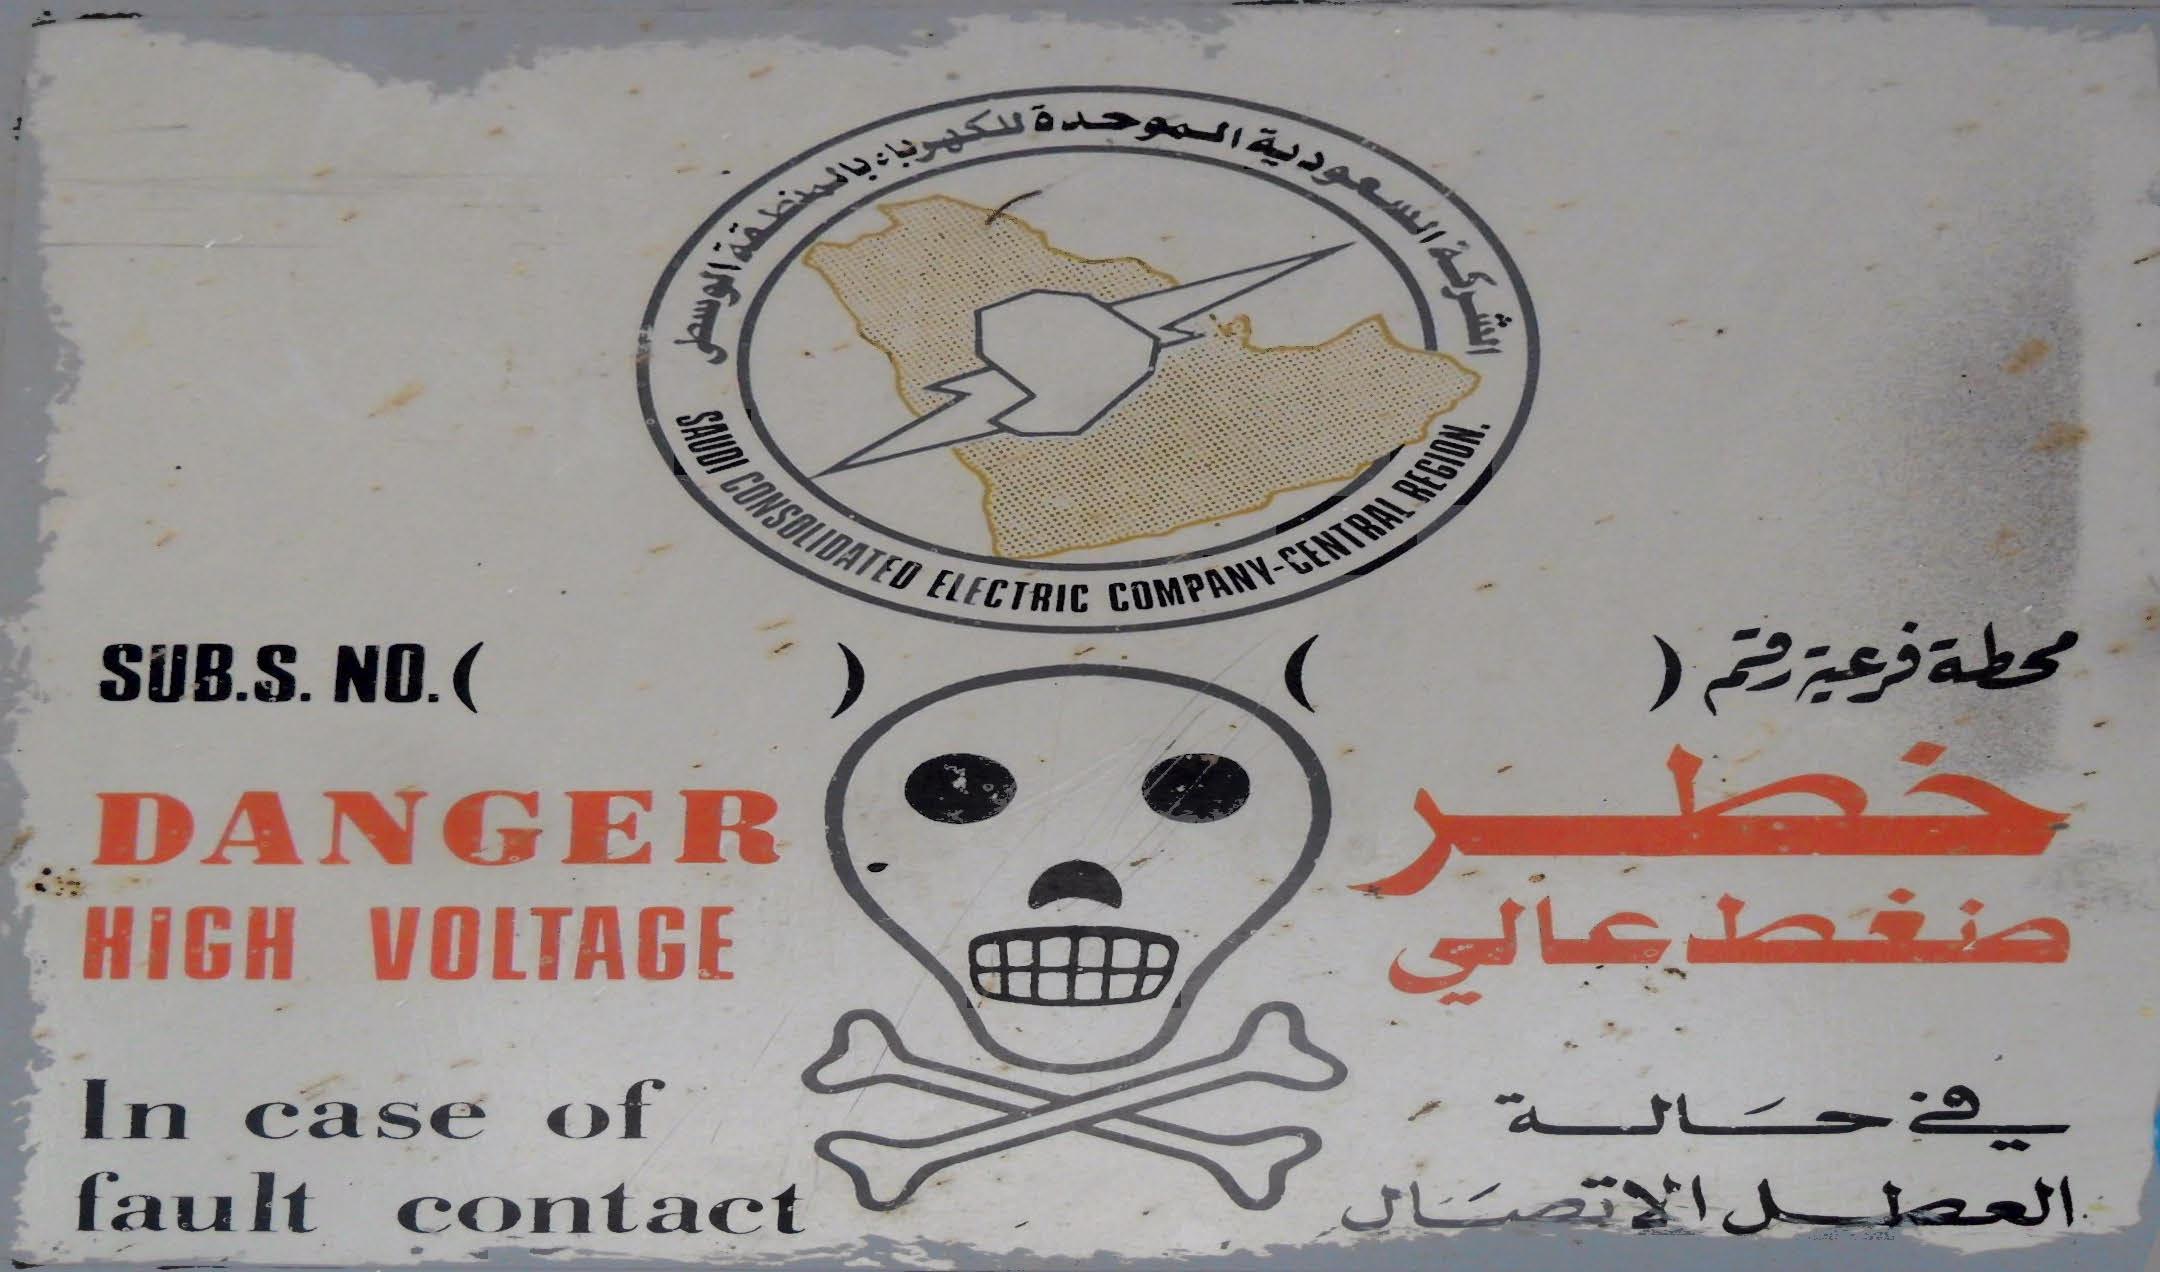 File:Danger High Voltage - Riyadh, Saudi Arabia.jpg - Wikimedia Commons